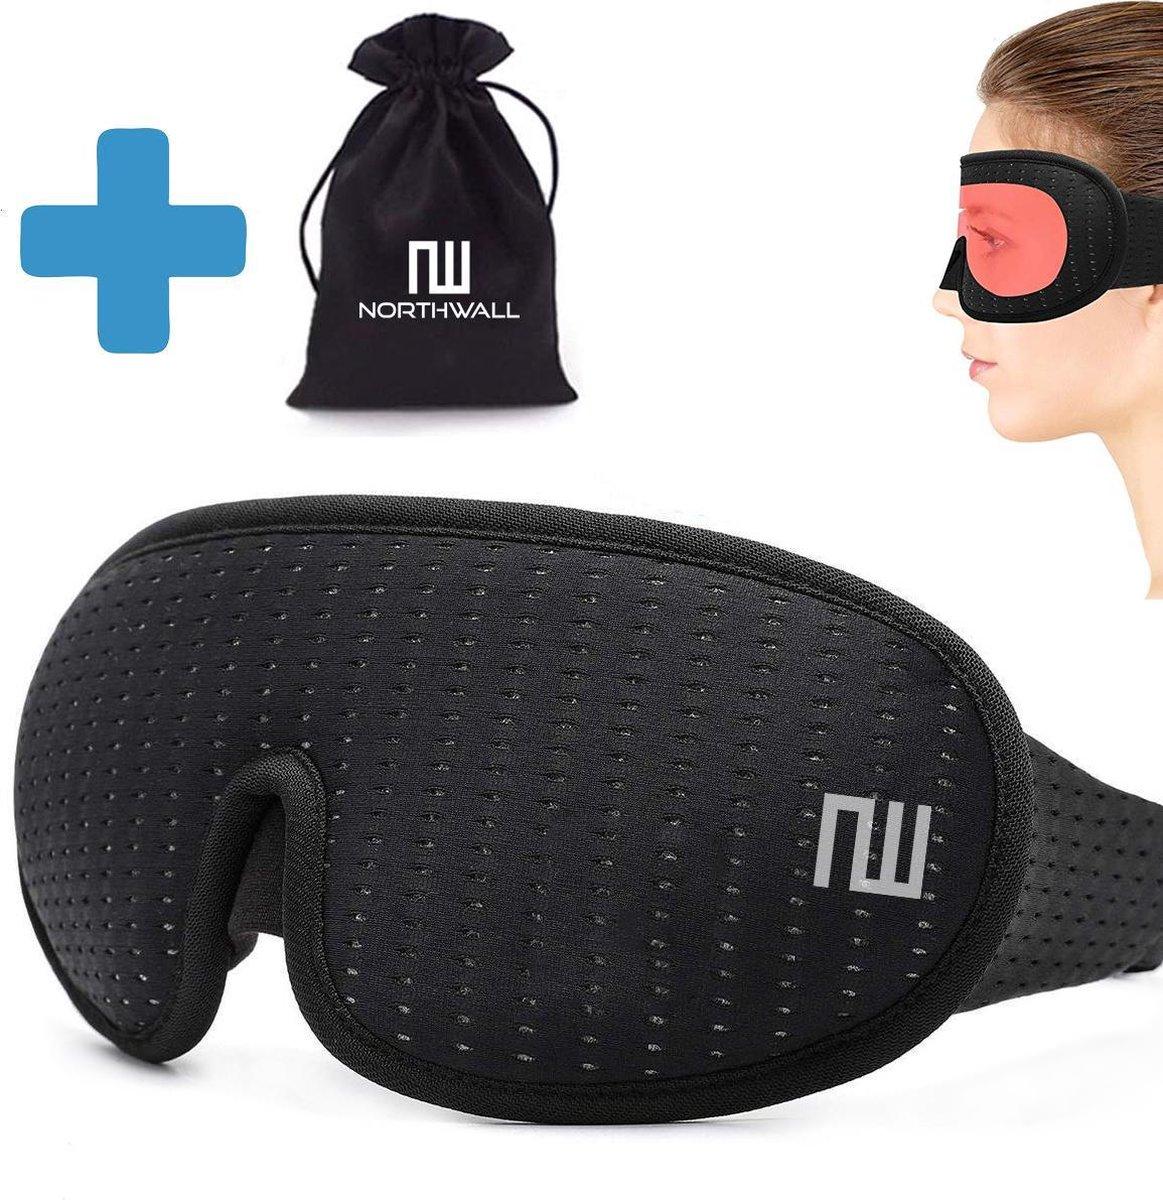 Slaapmasker Luxe -  100% Verduisterend - 3D Traagschuim - met Opbergzakje